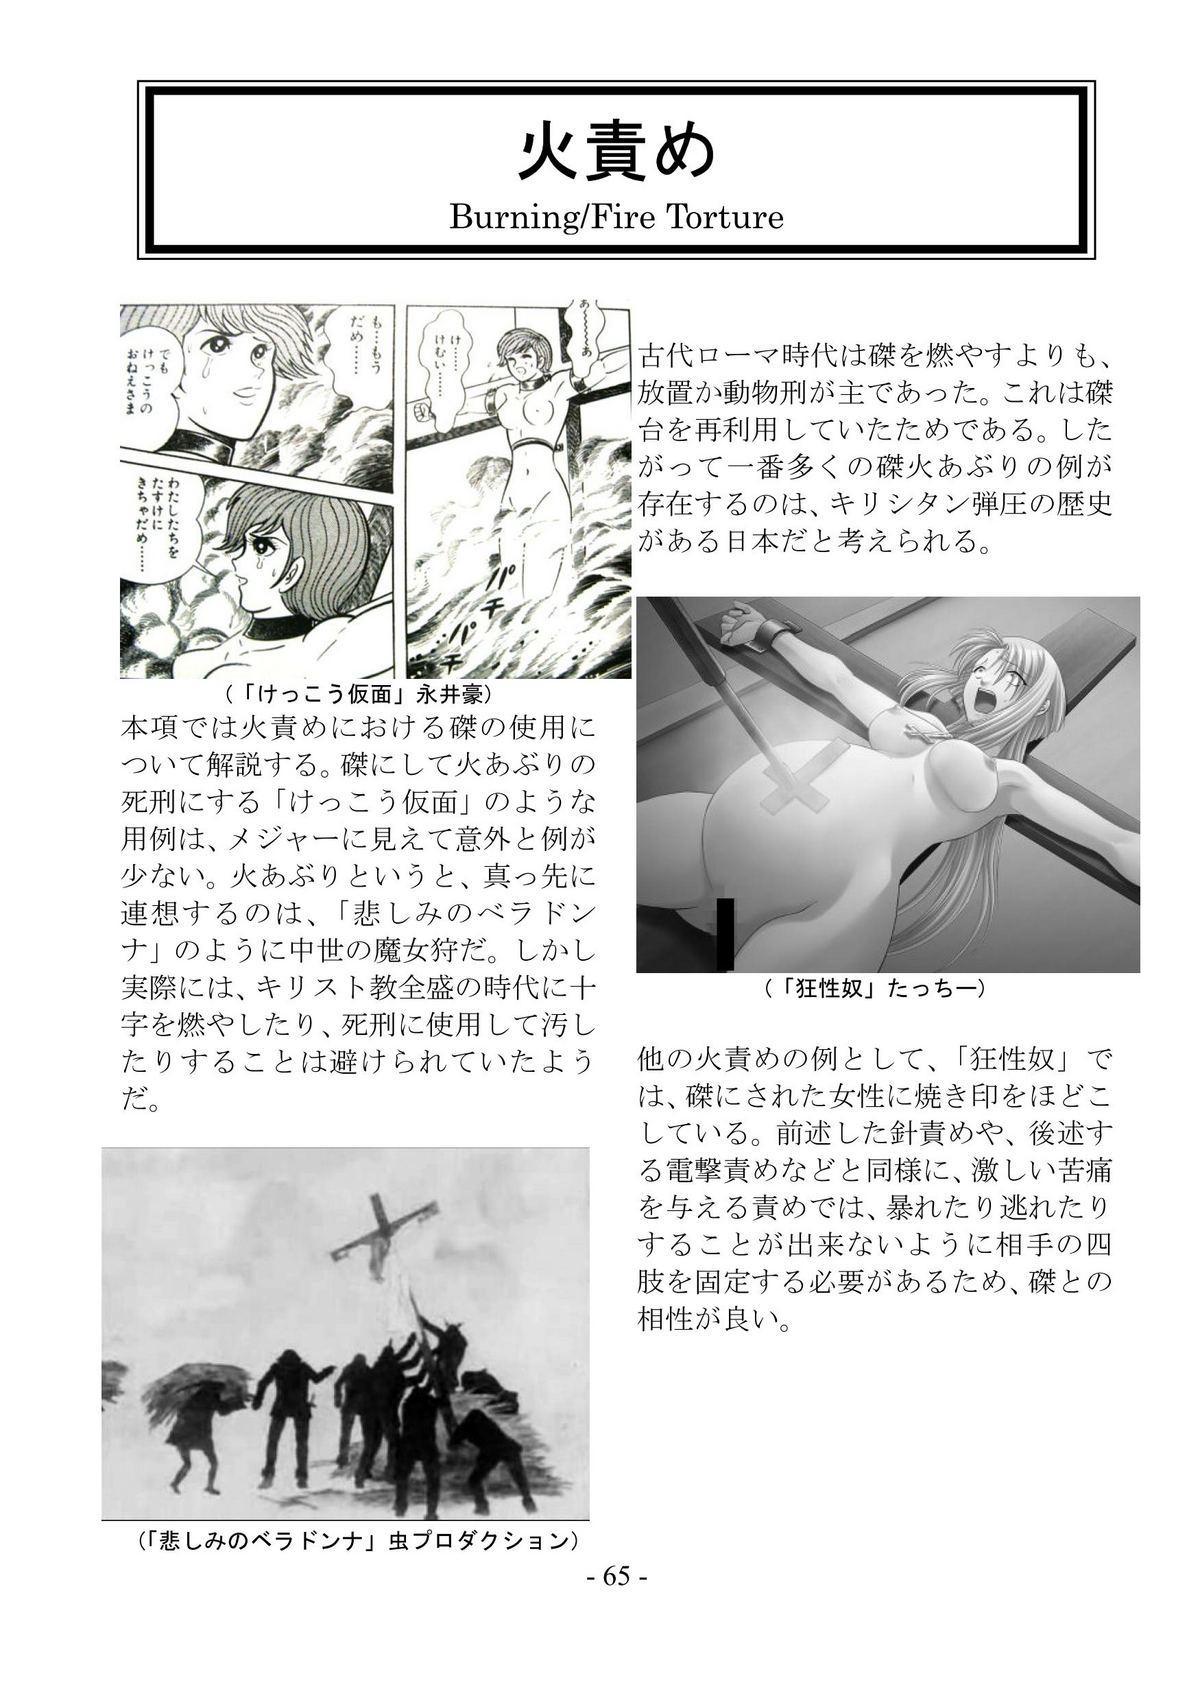 encyclopedia of crucifixion 65